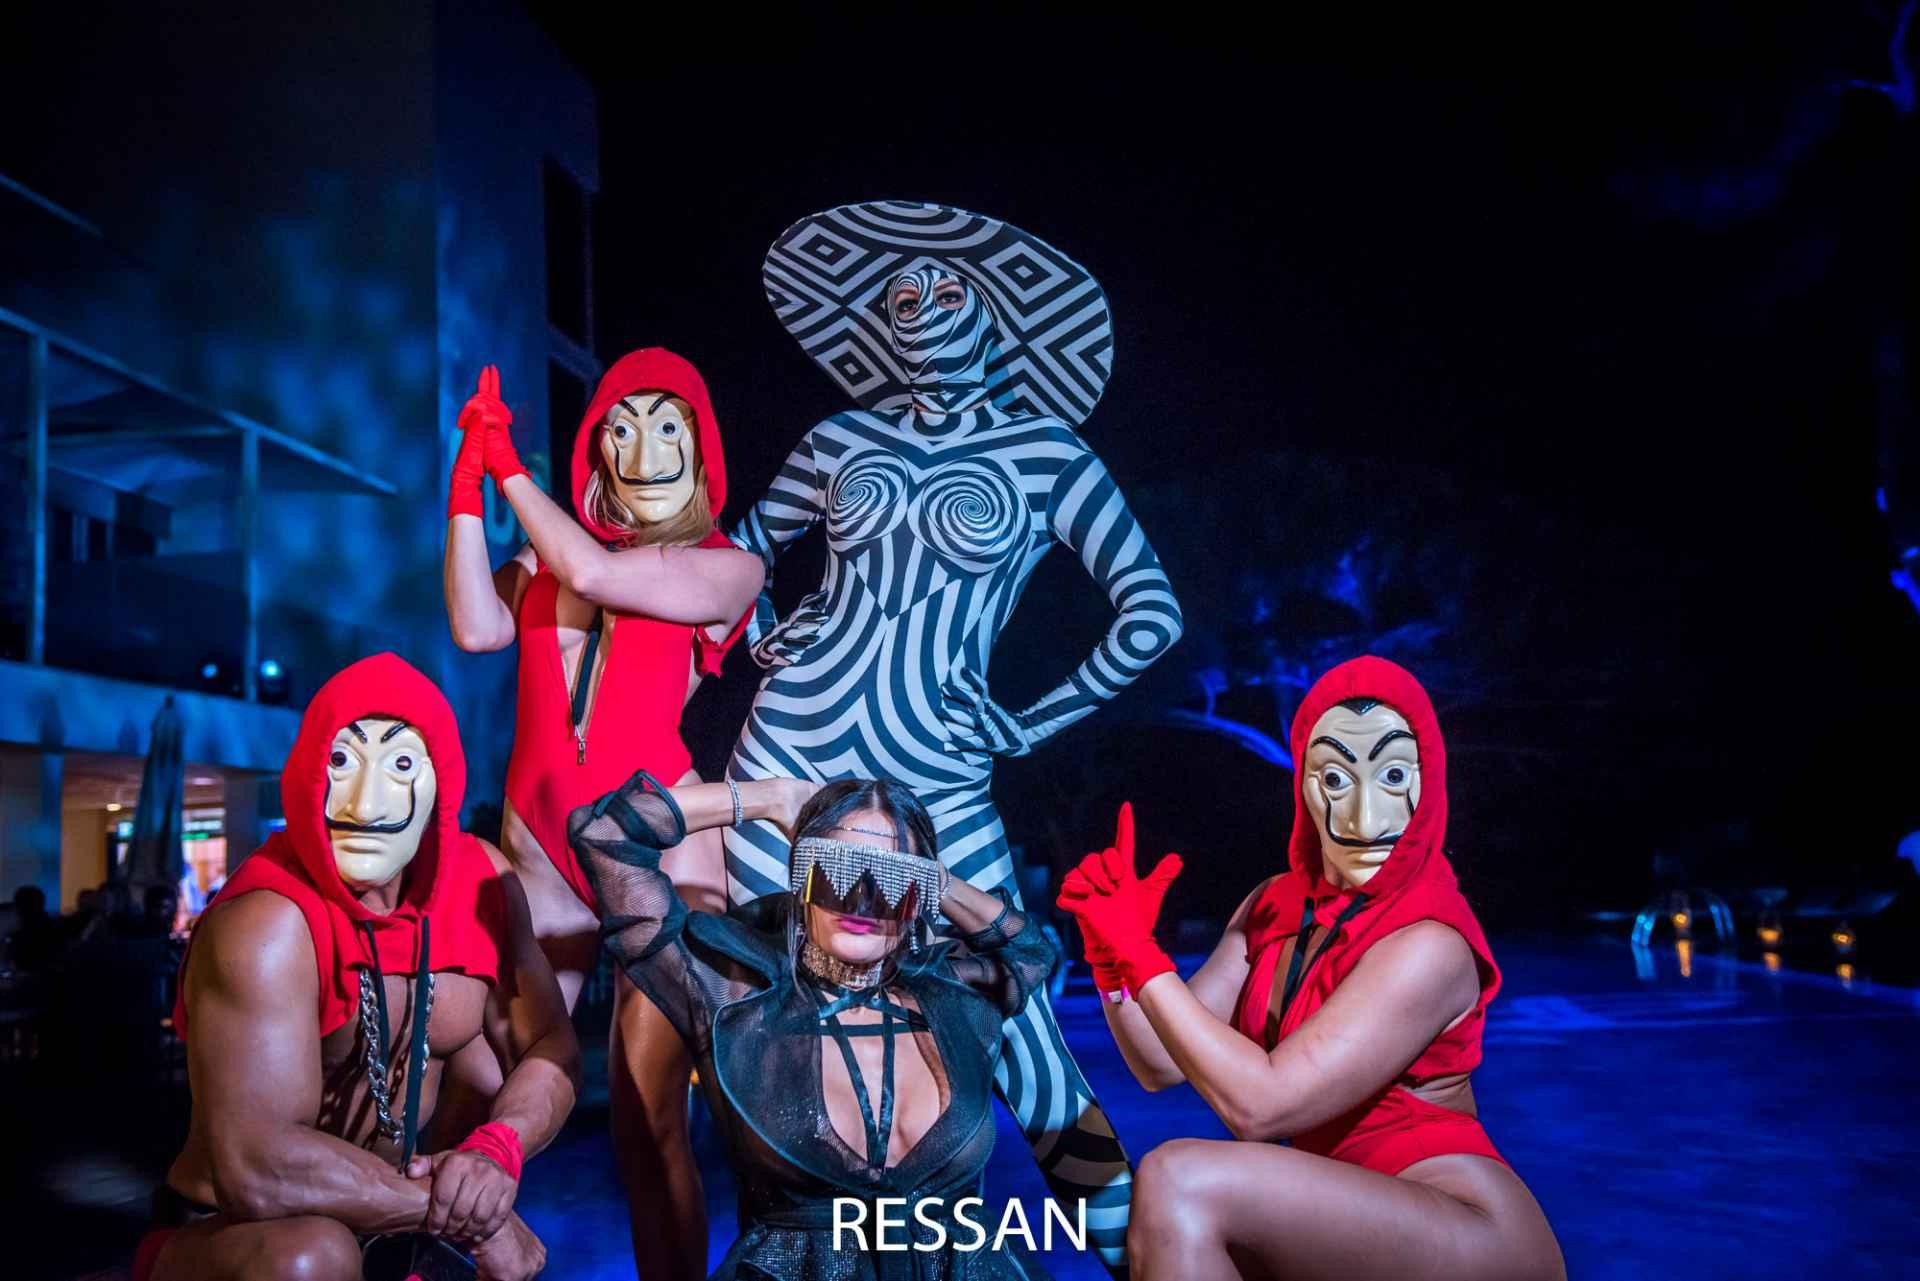 SDC Ibiza Ressan Incognito Night Swingers Resort Theme Party